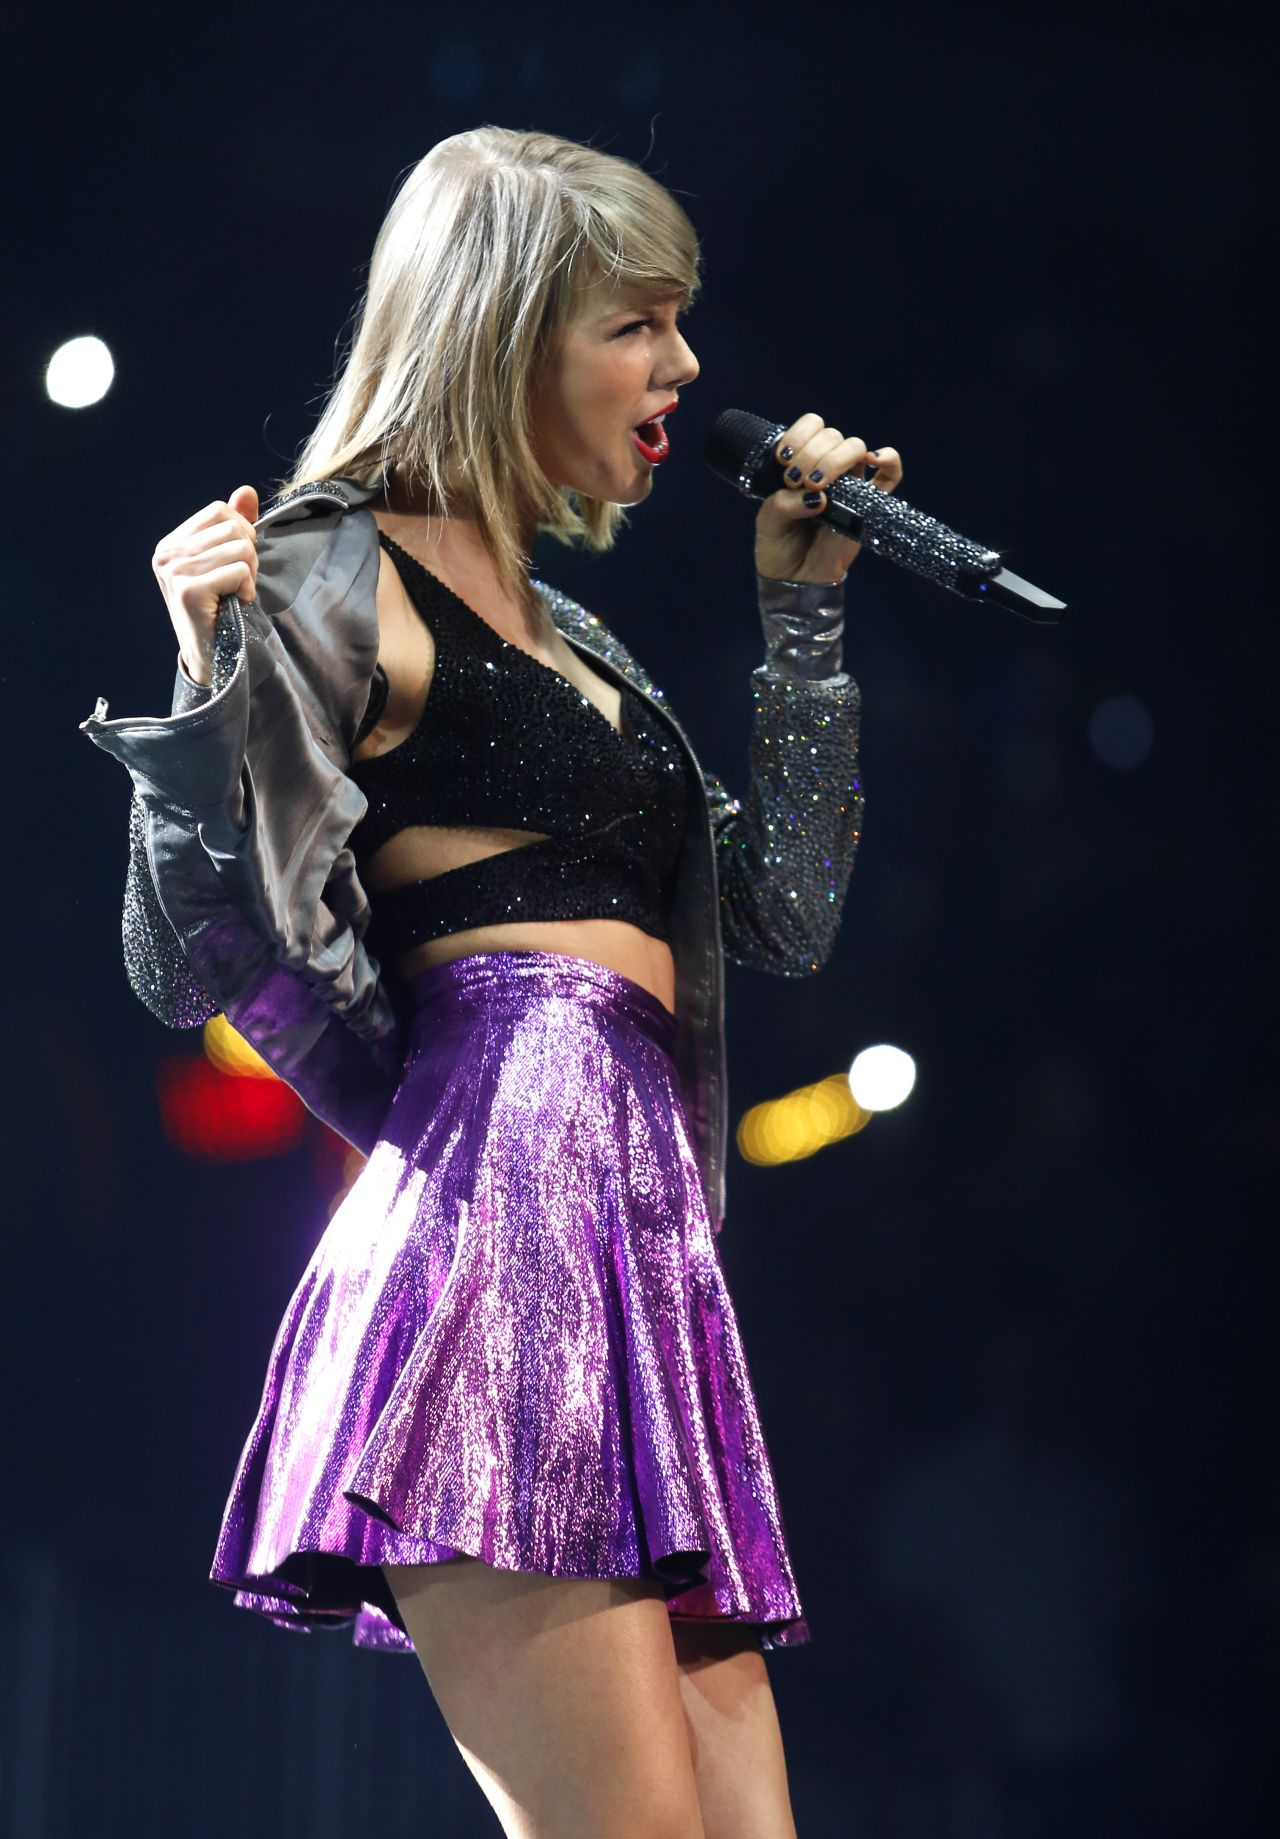 Taylor Swift 1989 World Tour Louisville Concert June 2015 Celebmafia